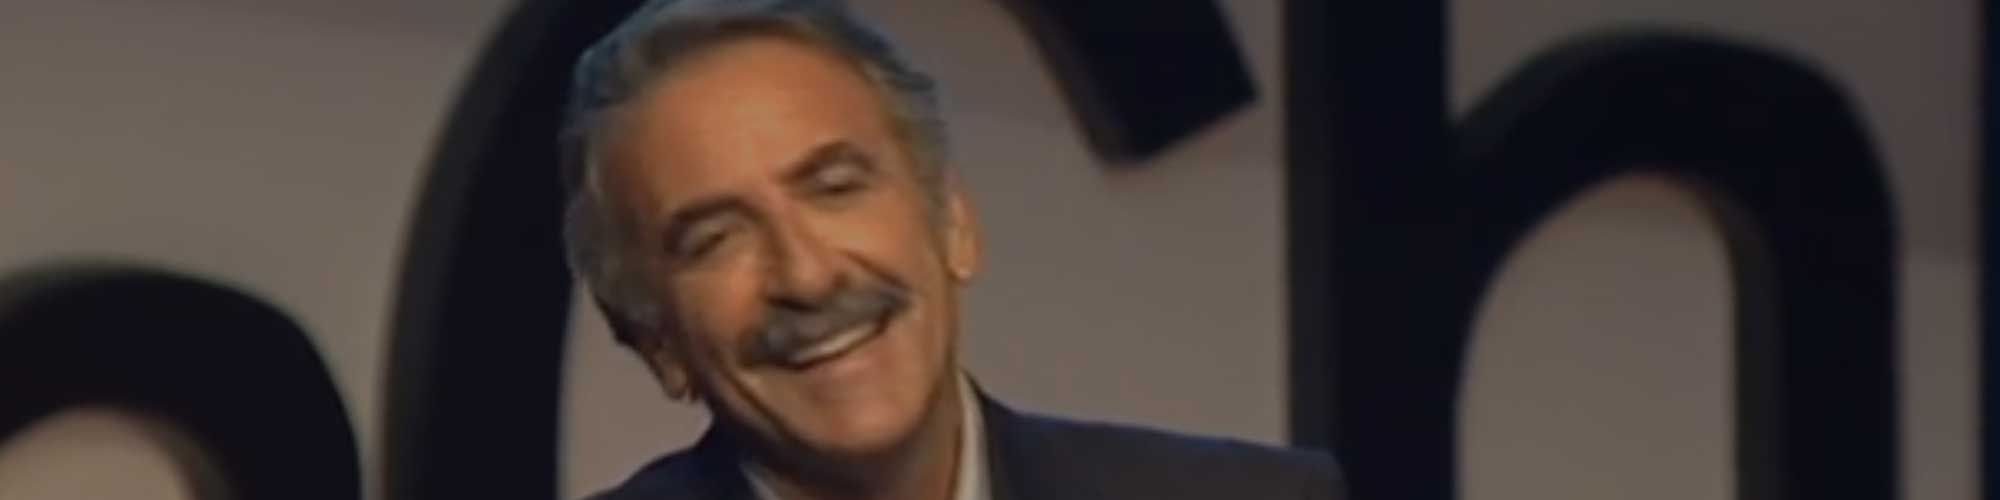 TED Video – Ernesto Sirolli